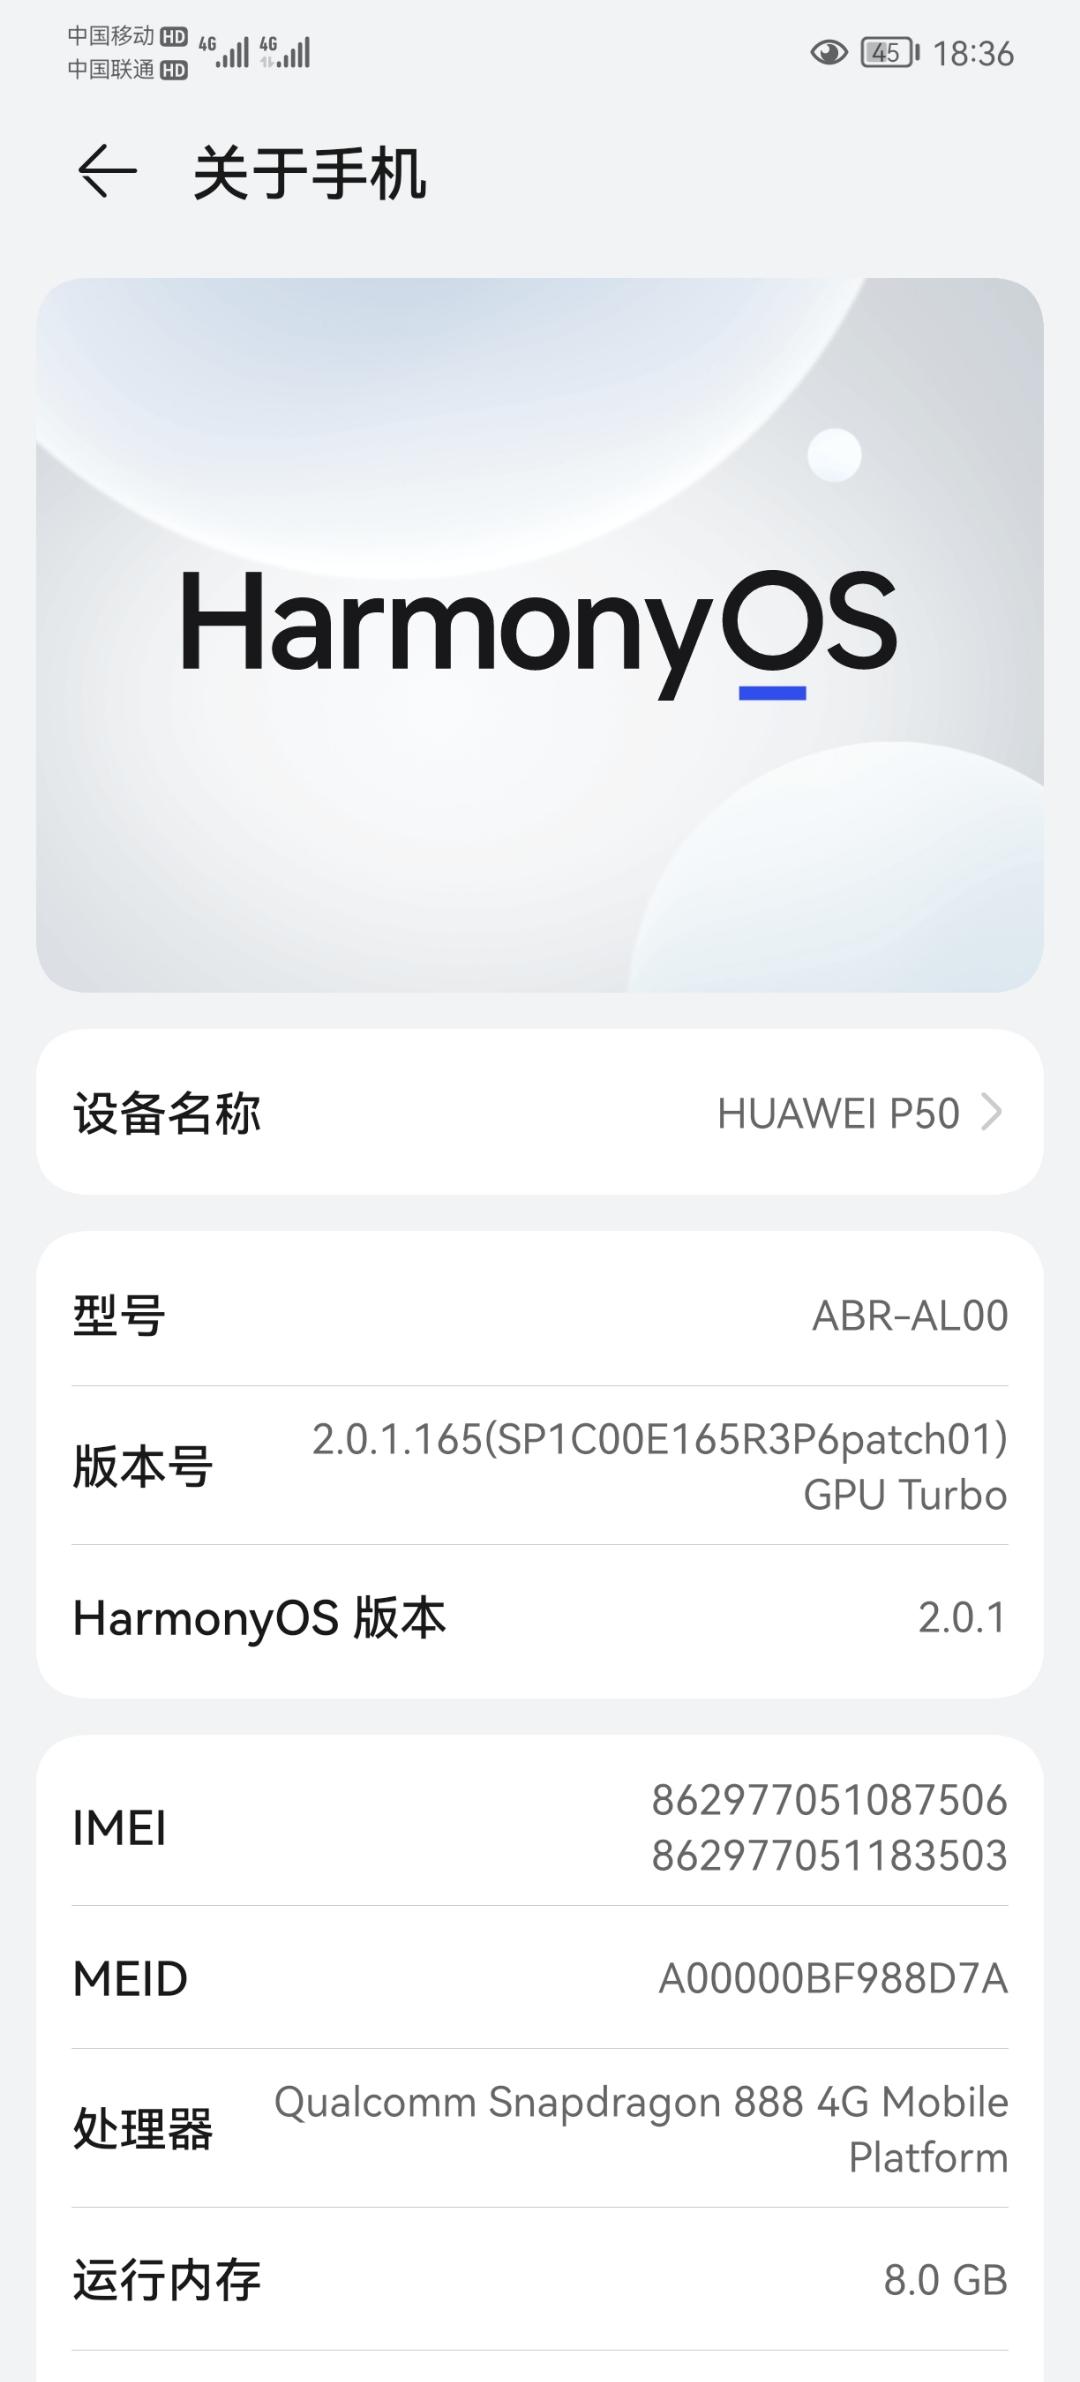 Screenshot_20211013_183657_com.android.settings.jpg